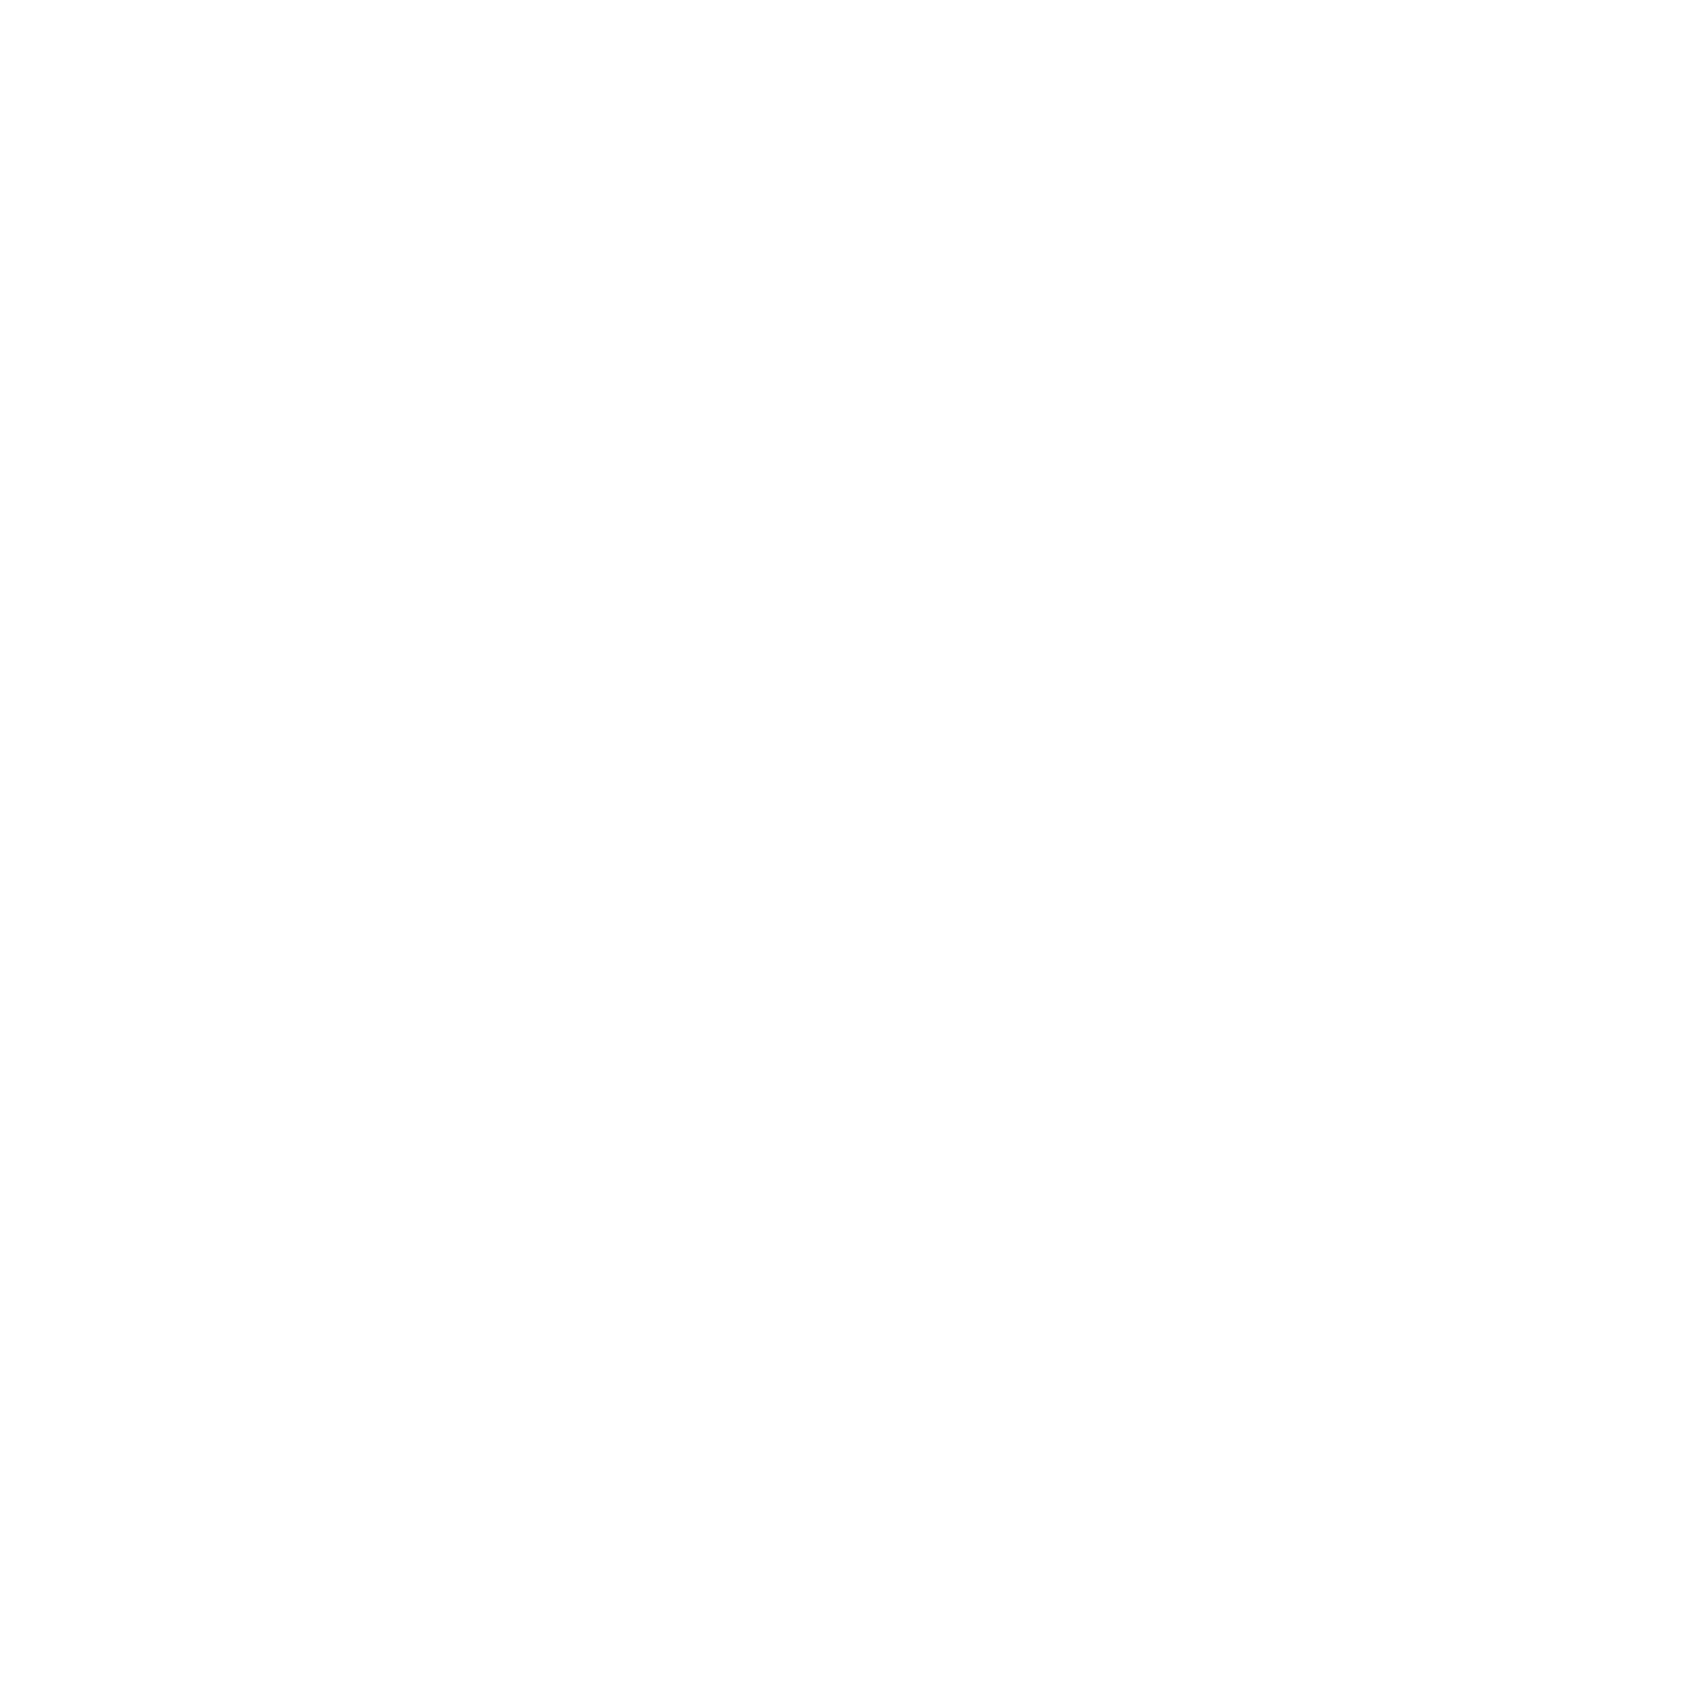 Upcoming events buku late. Facebook clipart emblem